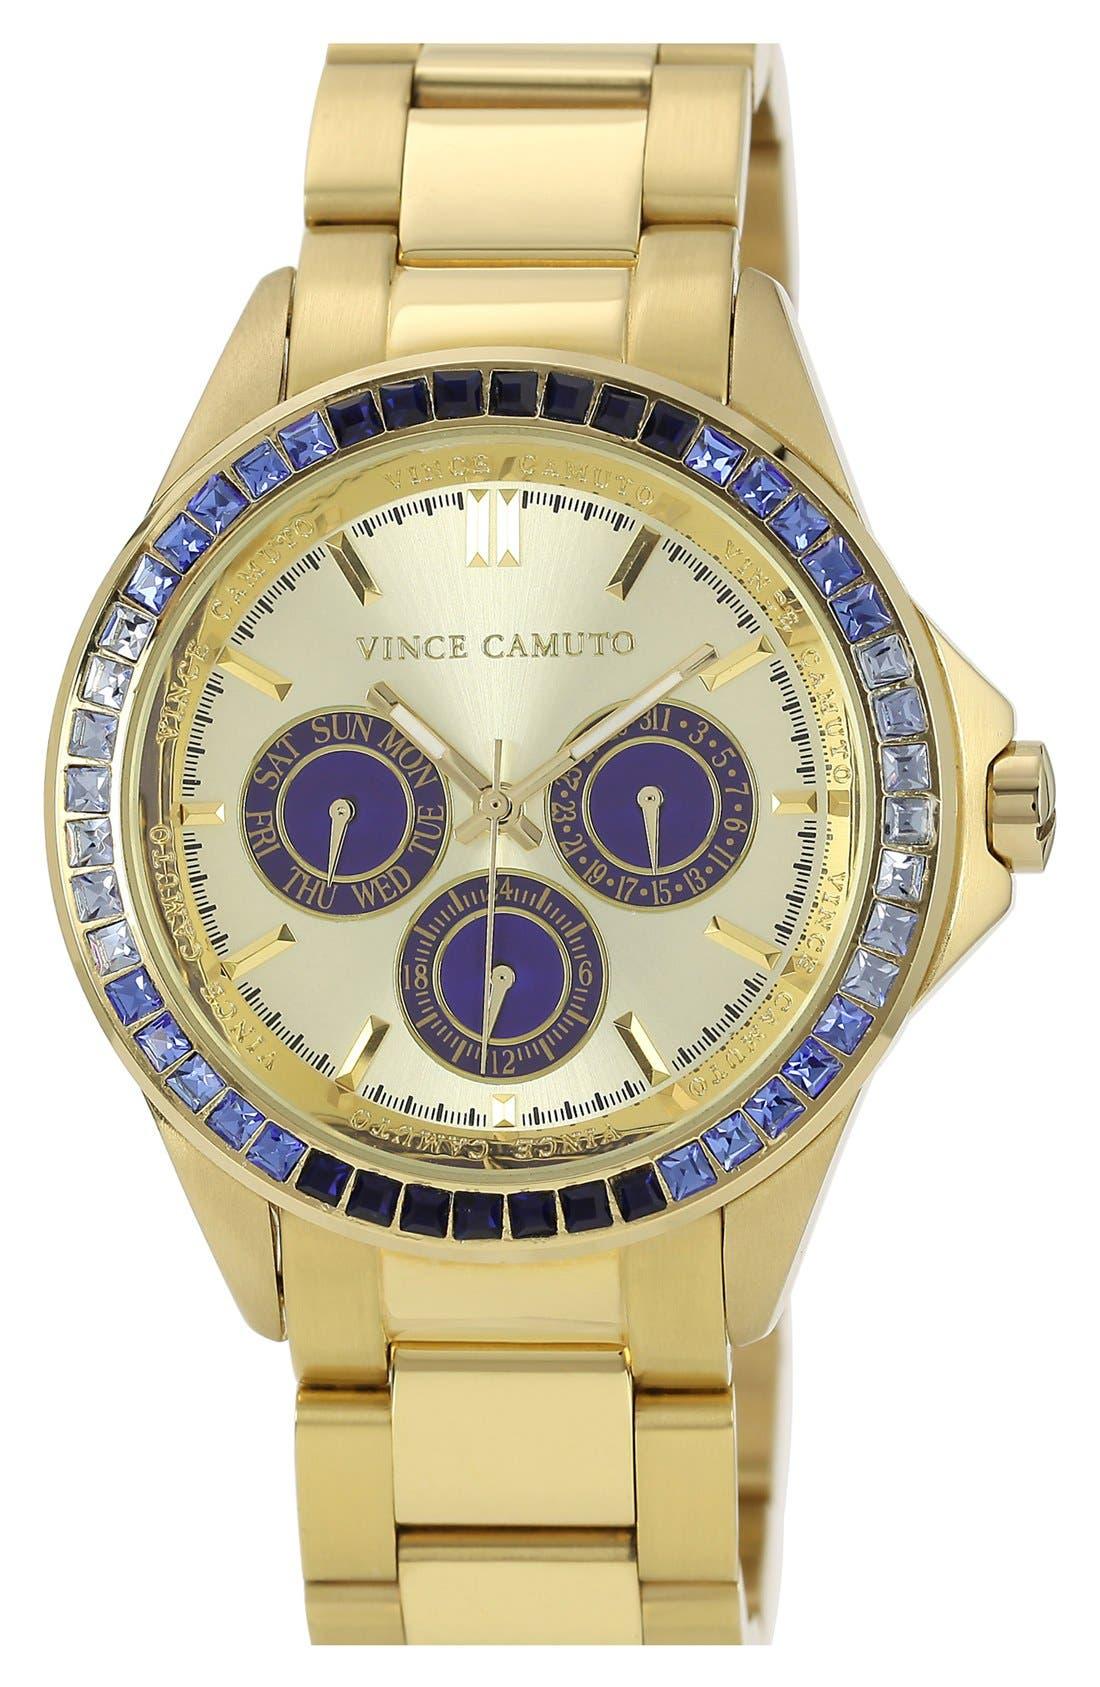 Main Image - Vince Camuto Round Crystal Bezel Bracelet Watch, 42mm